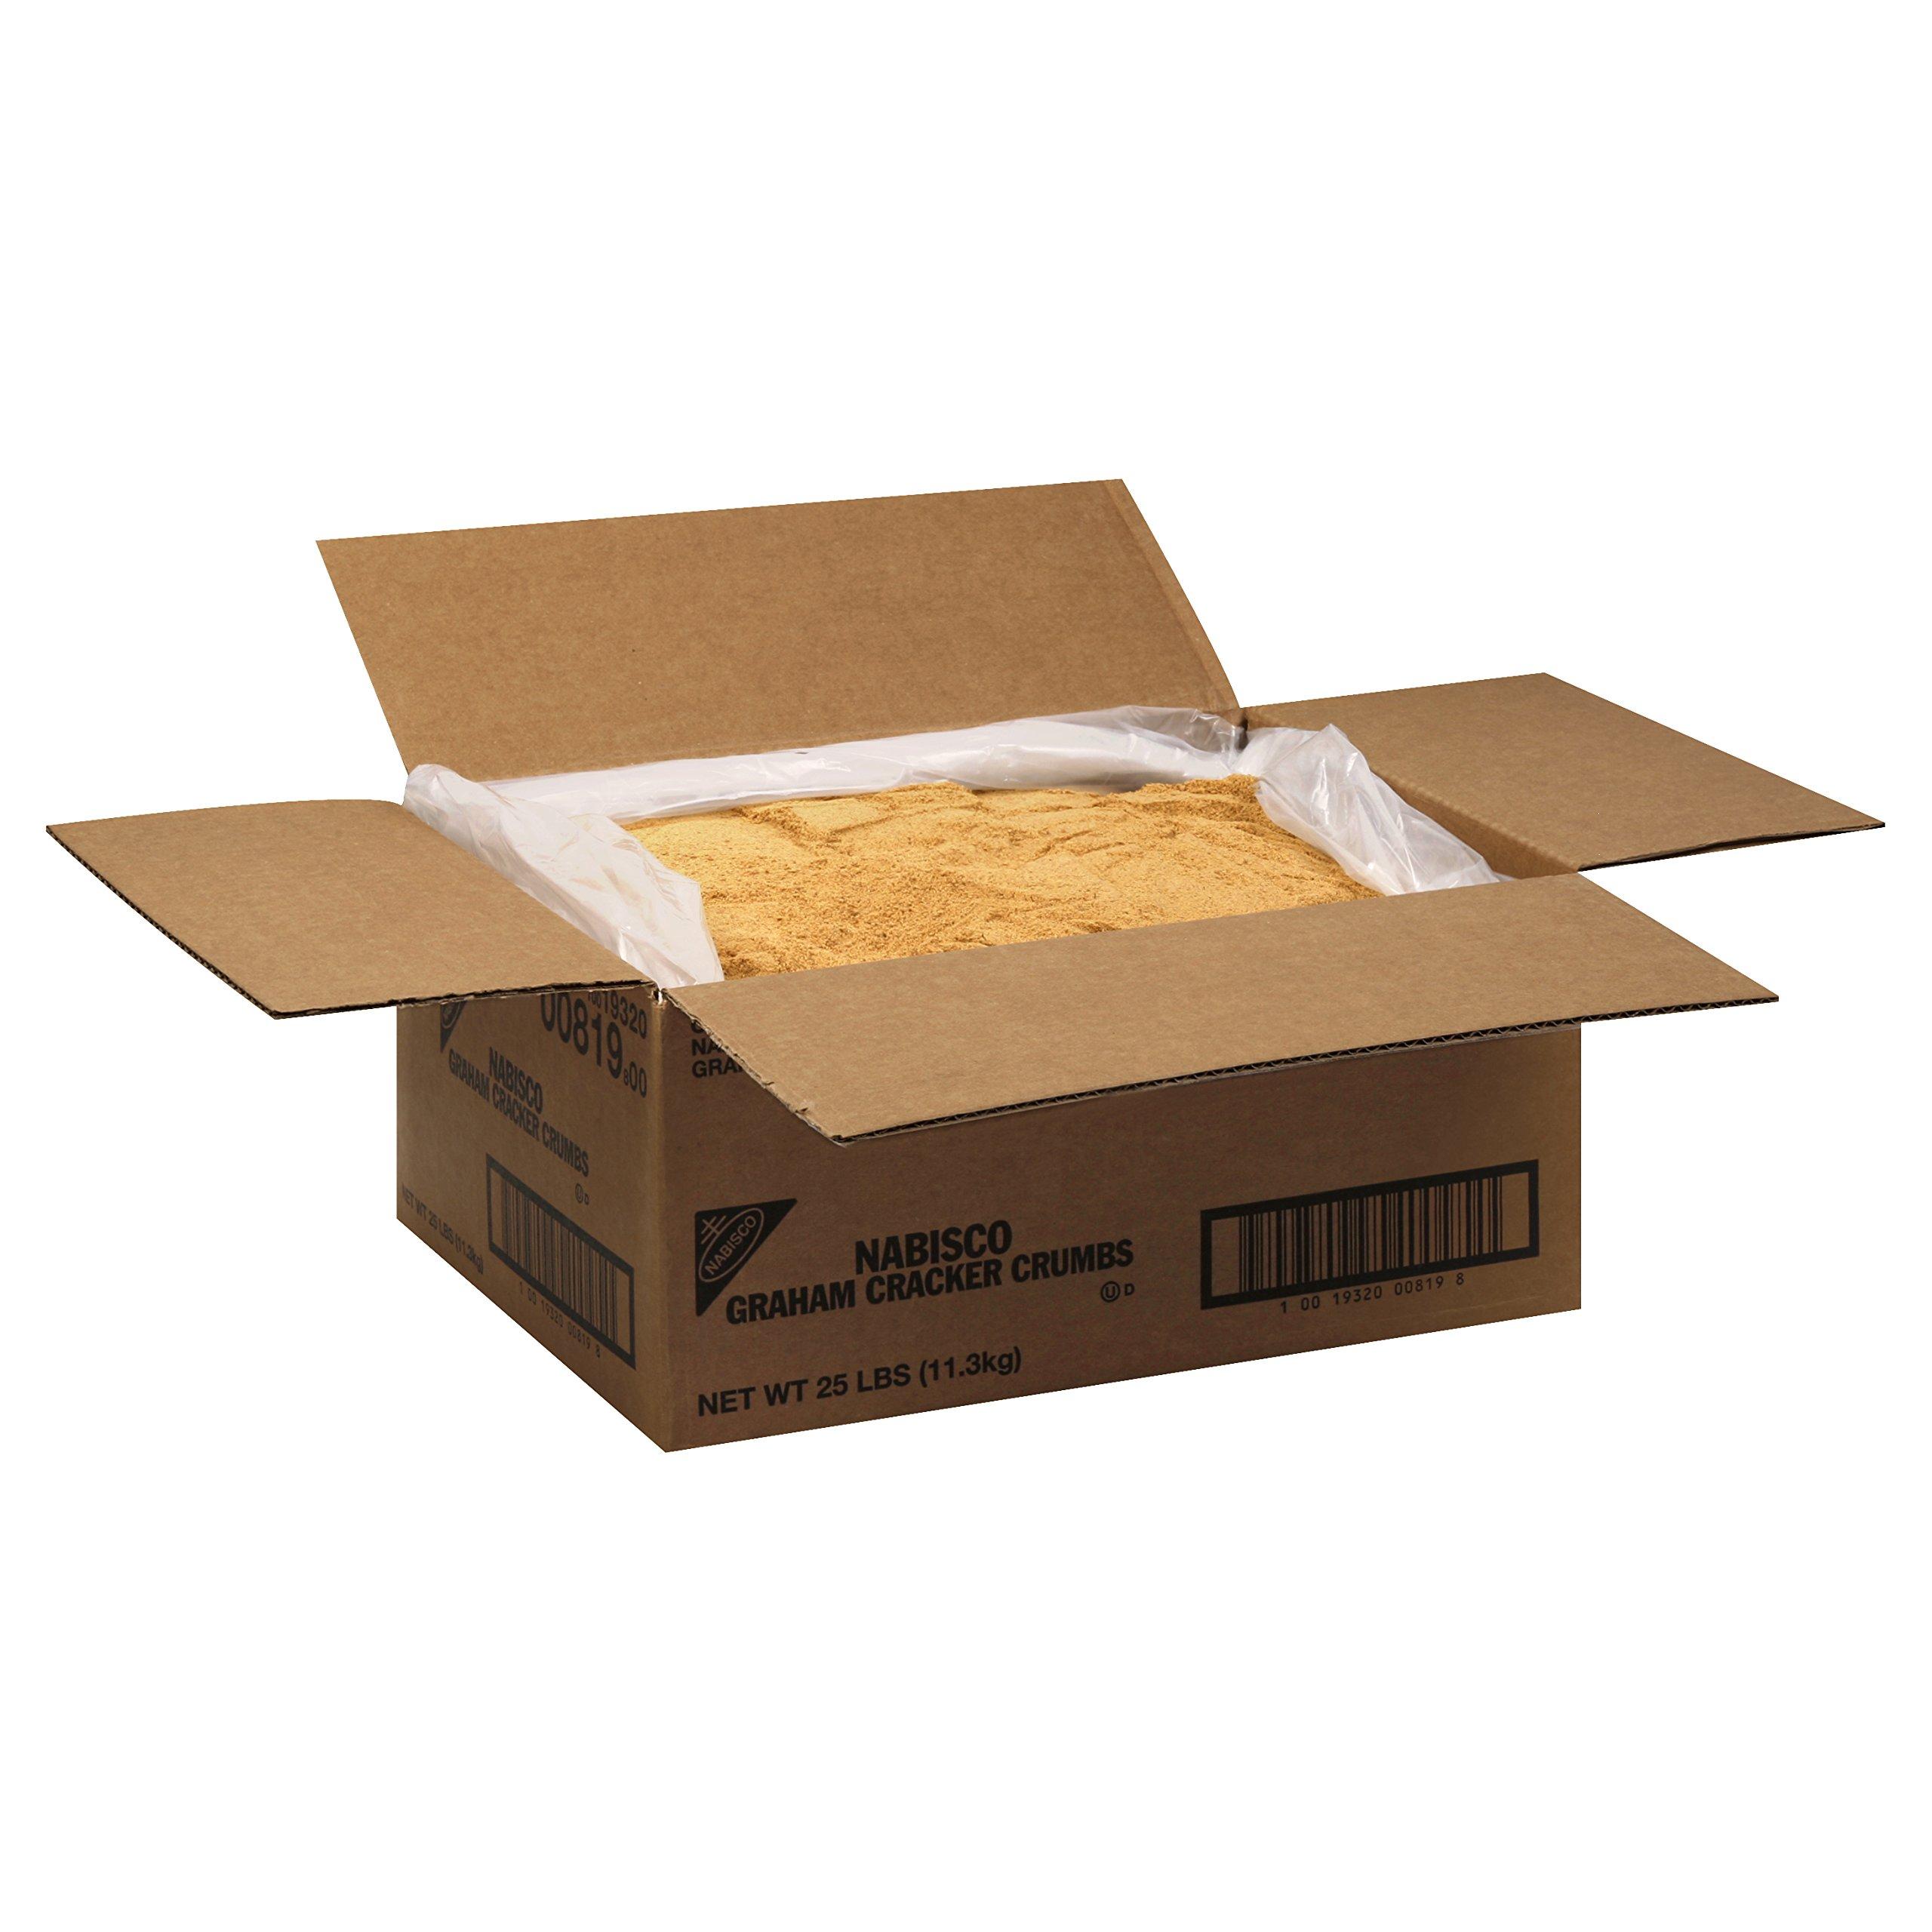 Nabisco Graham Crackers Crumbs, 25 lb Box